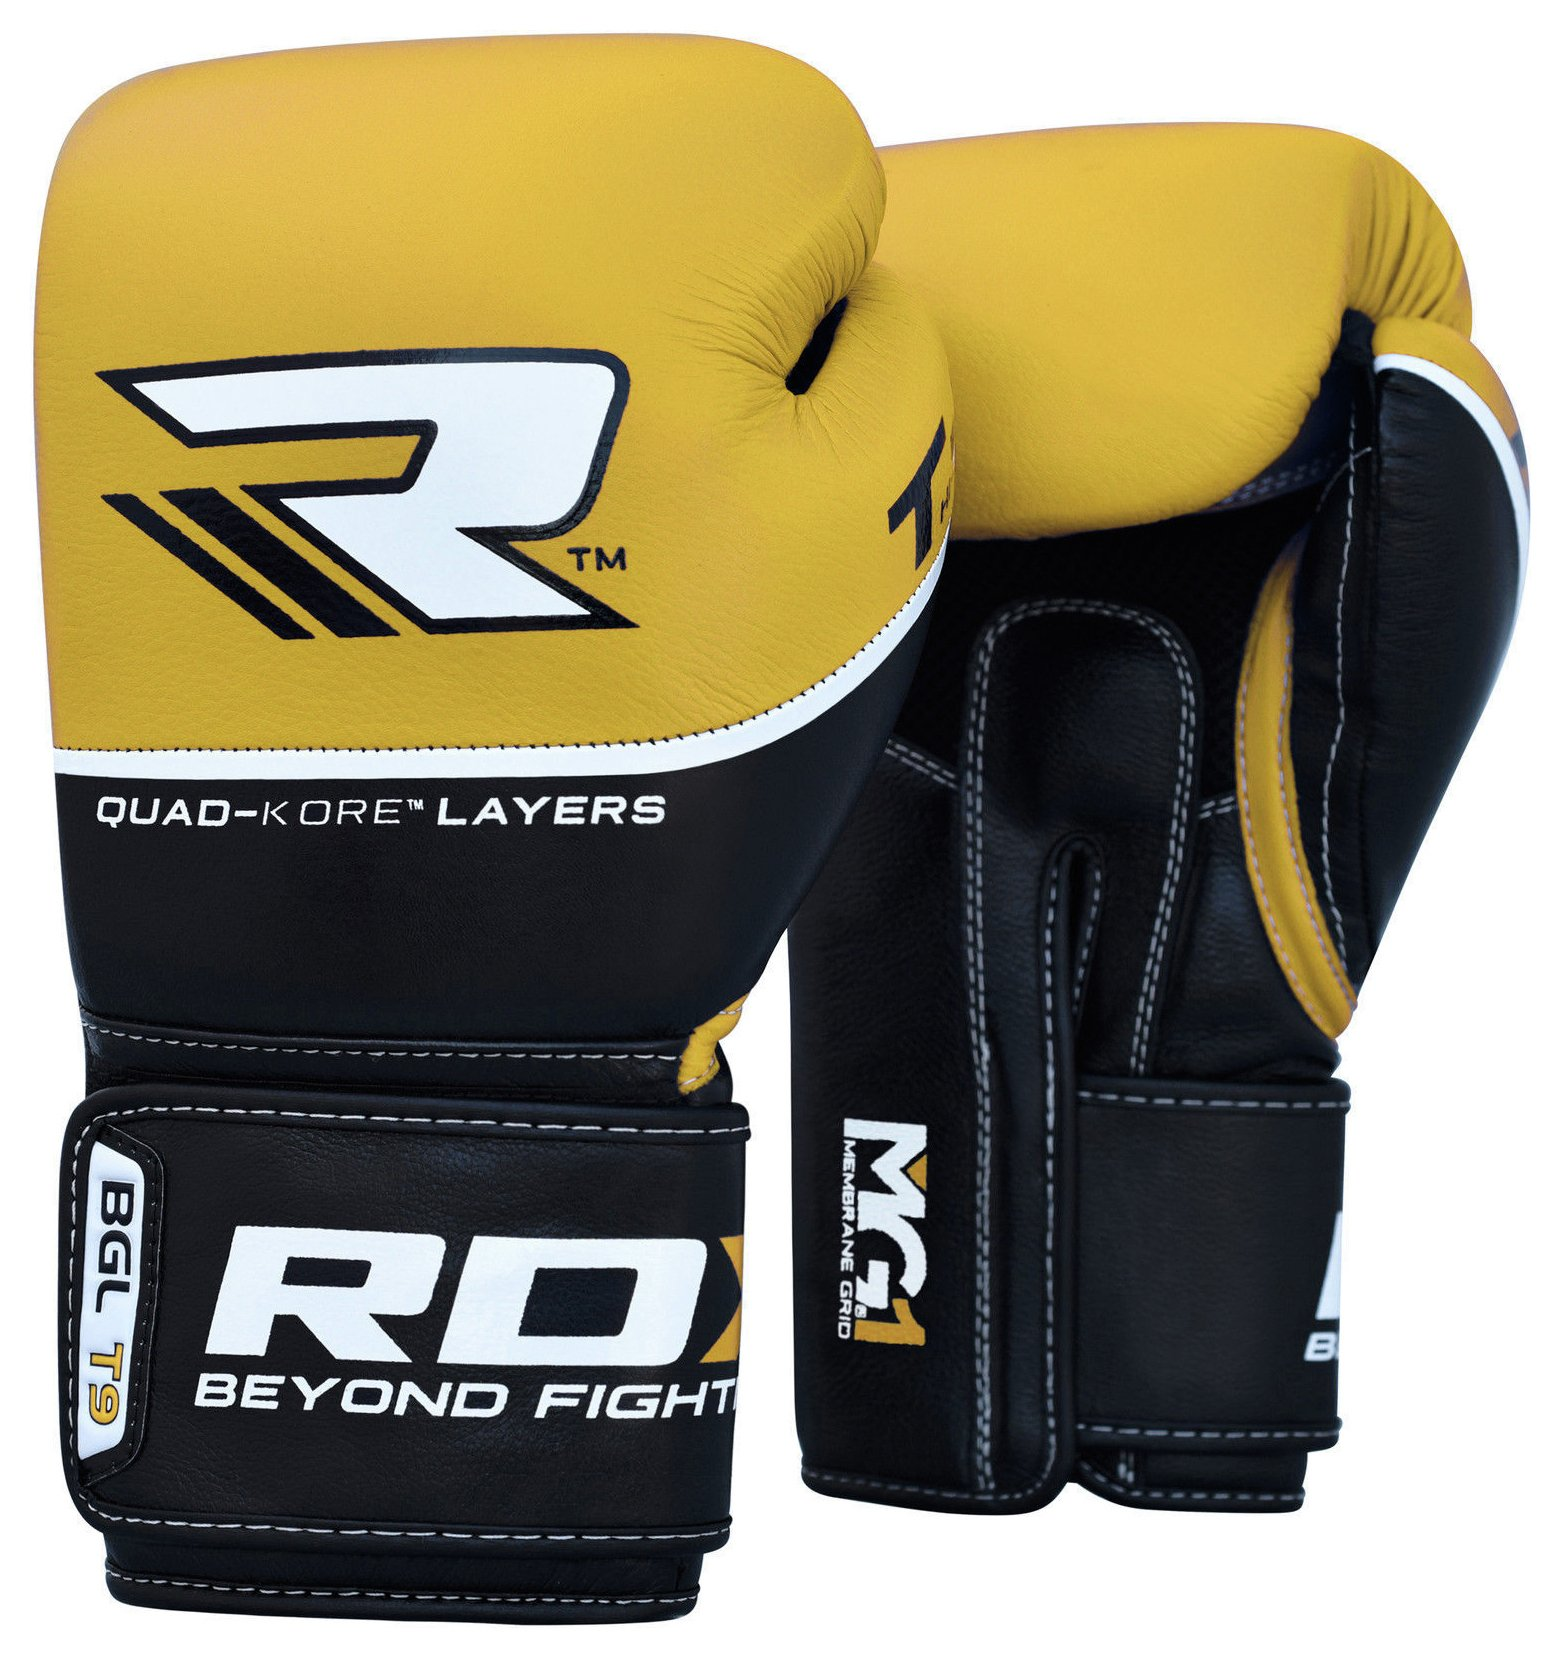 RDX - Quad Kore 12oz Boxing Gloves - Yellow lowest price